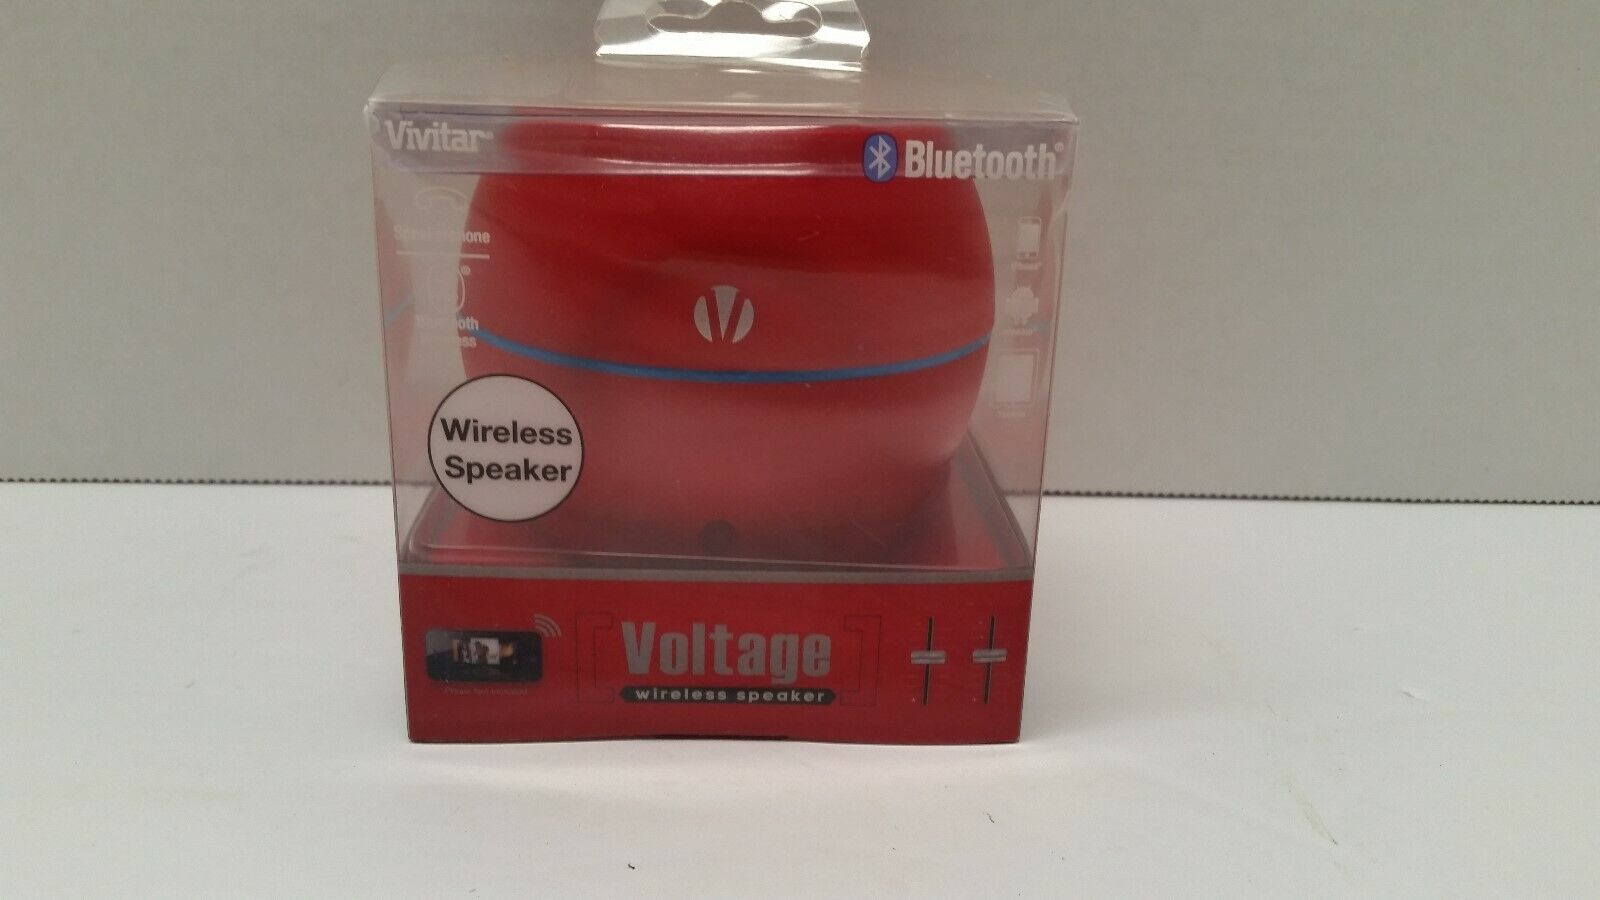 vivtiar voltage wireless bluetooth speaker with usb